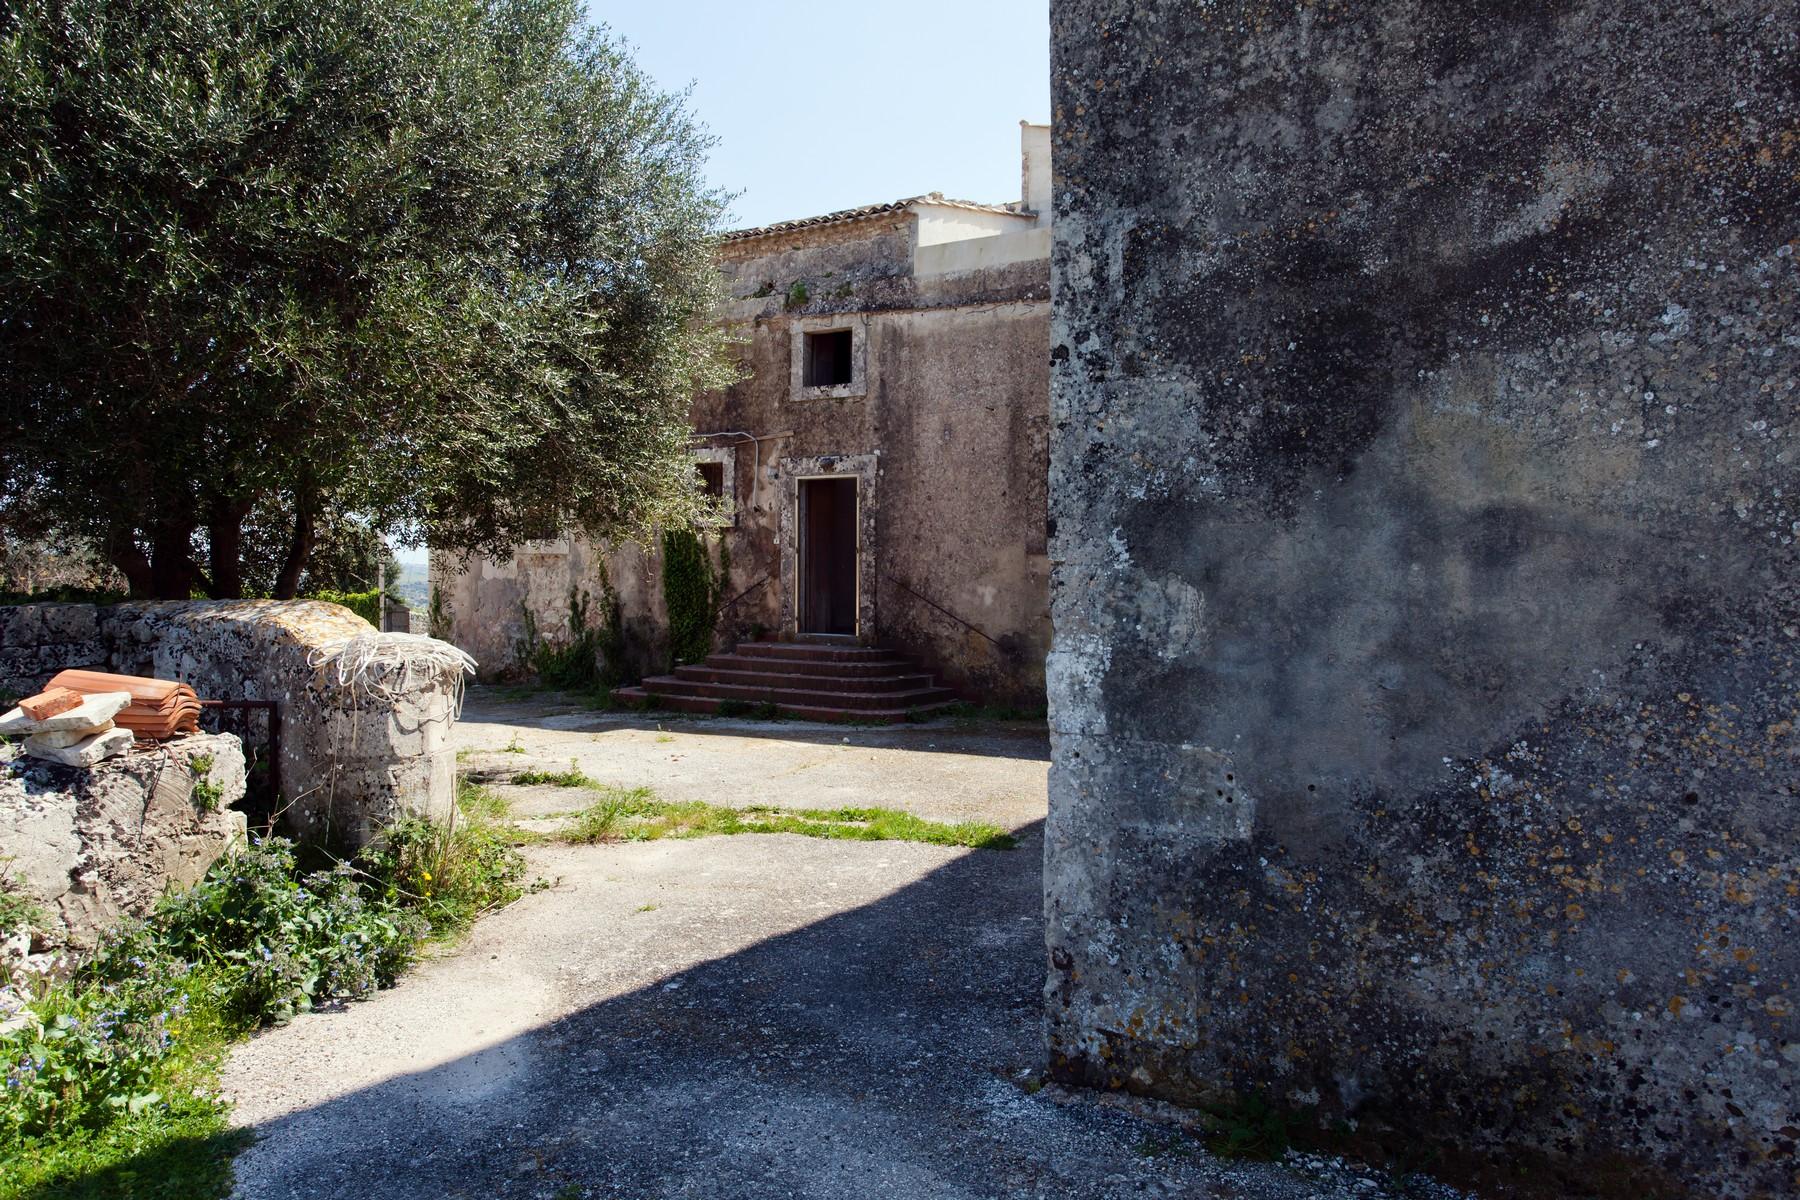 Casa indipendente in Vendita a Noto: 5 locali, 1000 mq - Foto 17